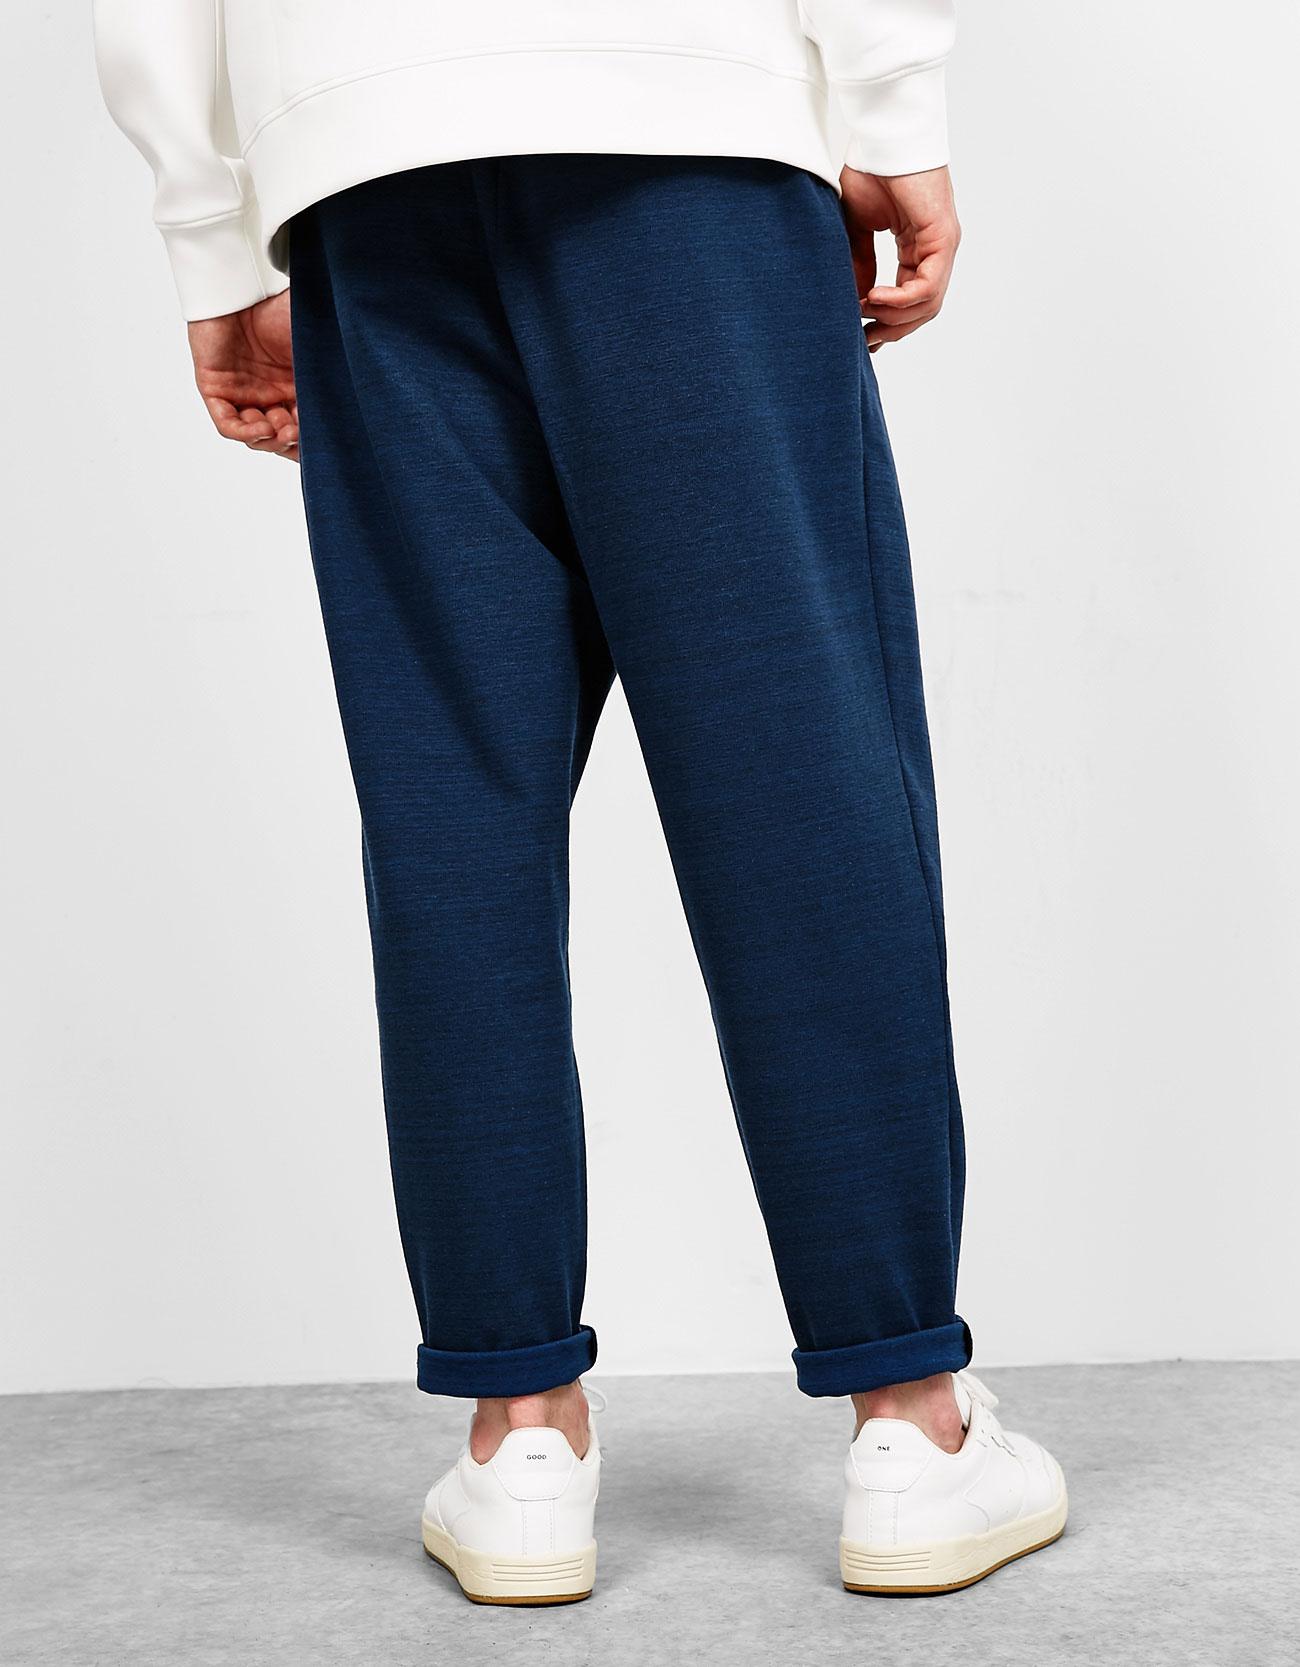 Plush trousers, £29.99 ( bershka.com )